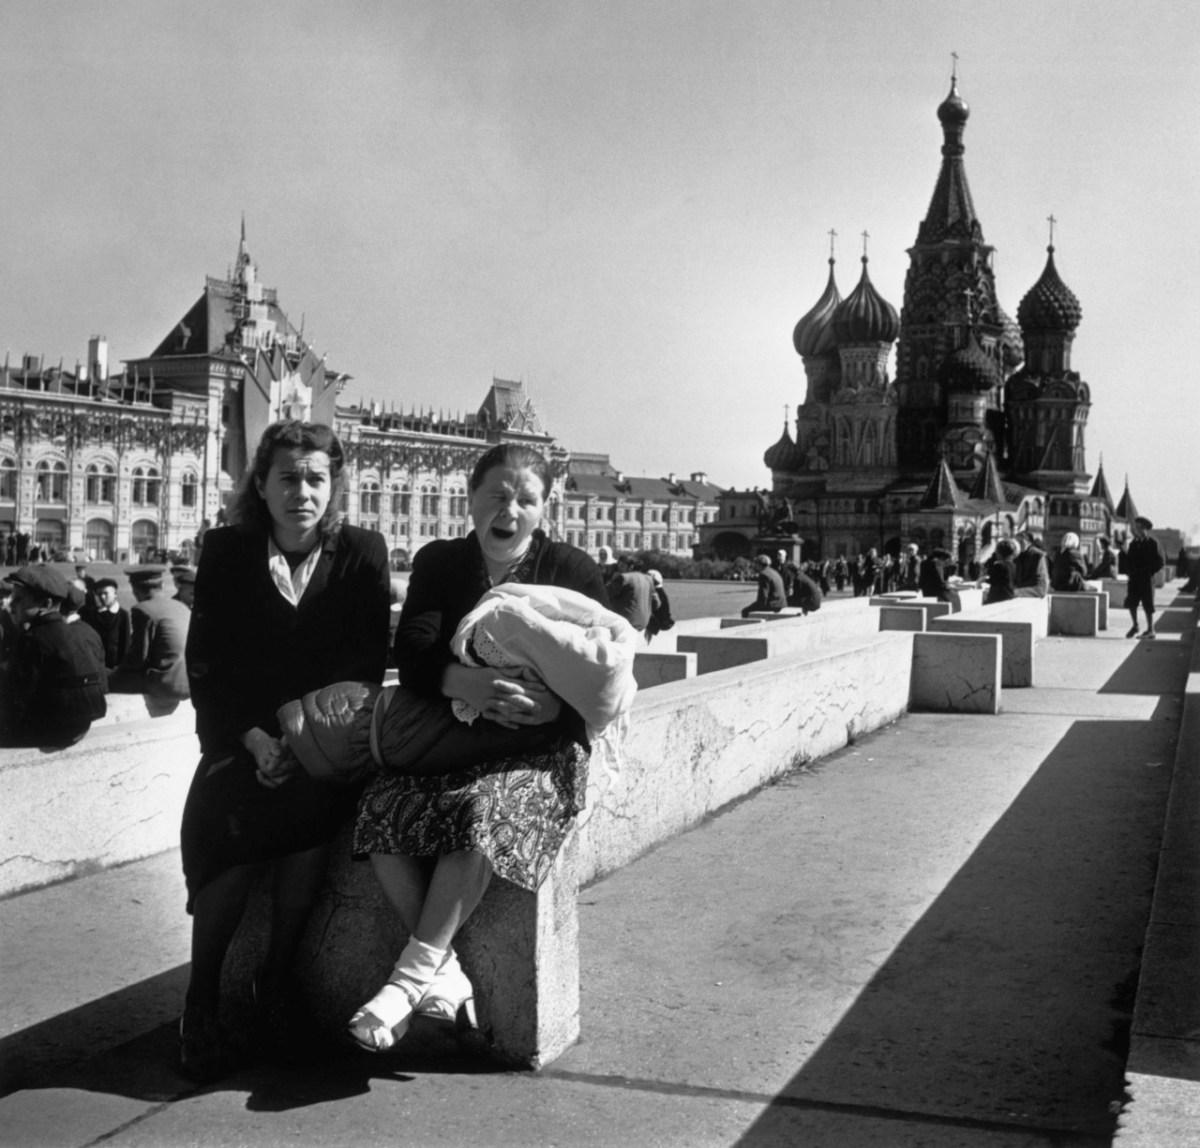 Kızıl Meydan, 1947.Fotoğraf: Robert Capa © Magnum Photos